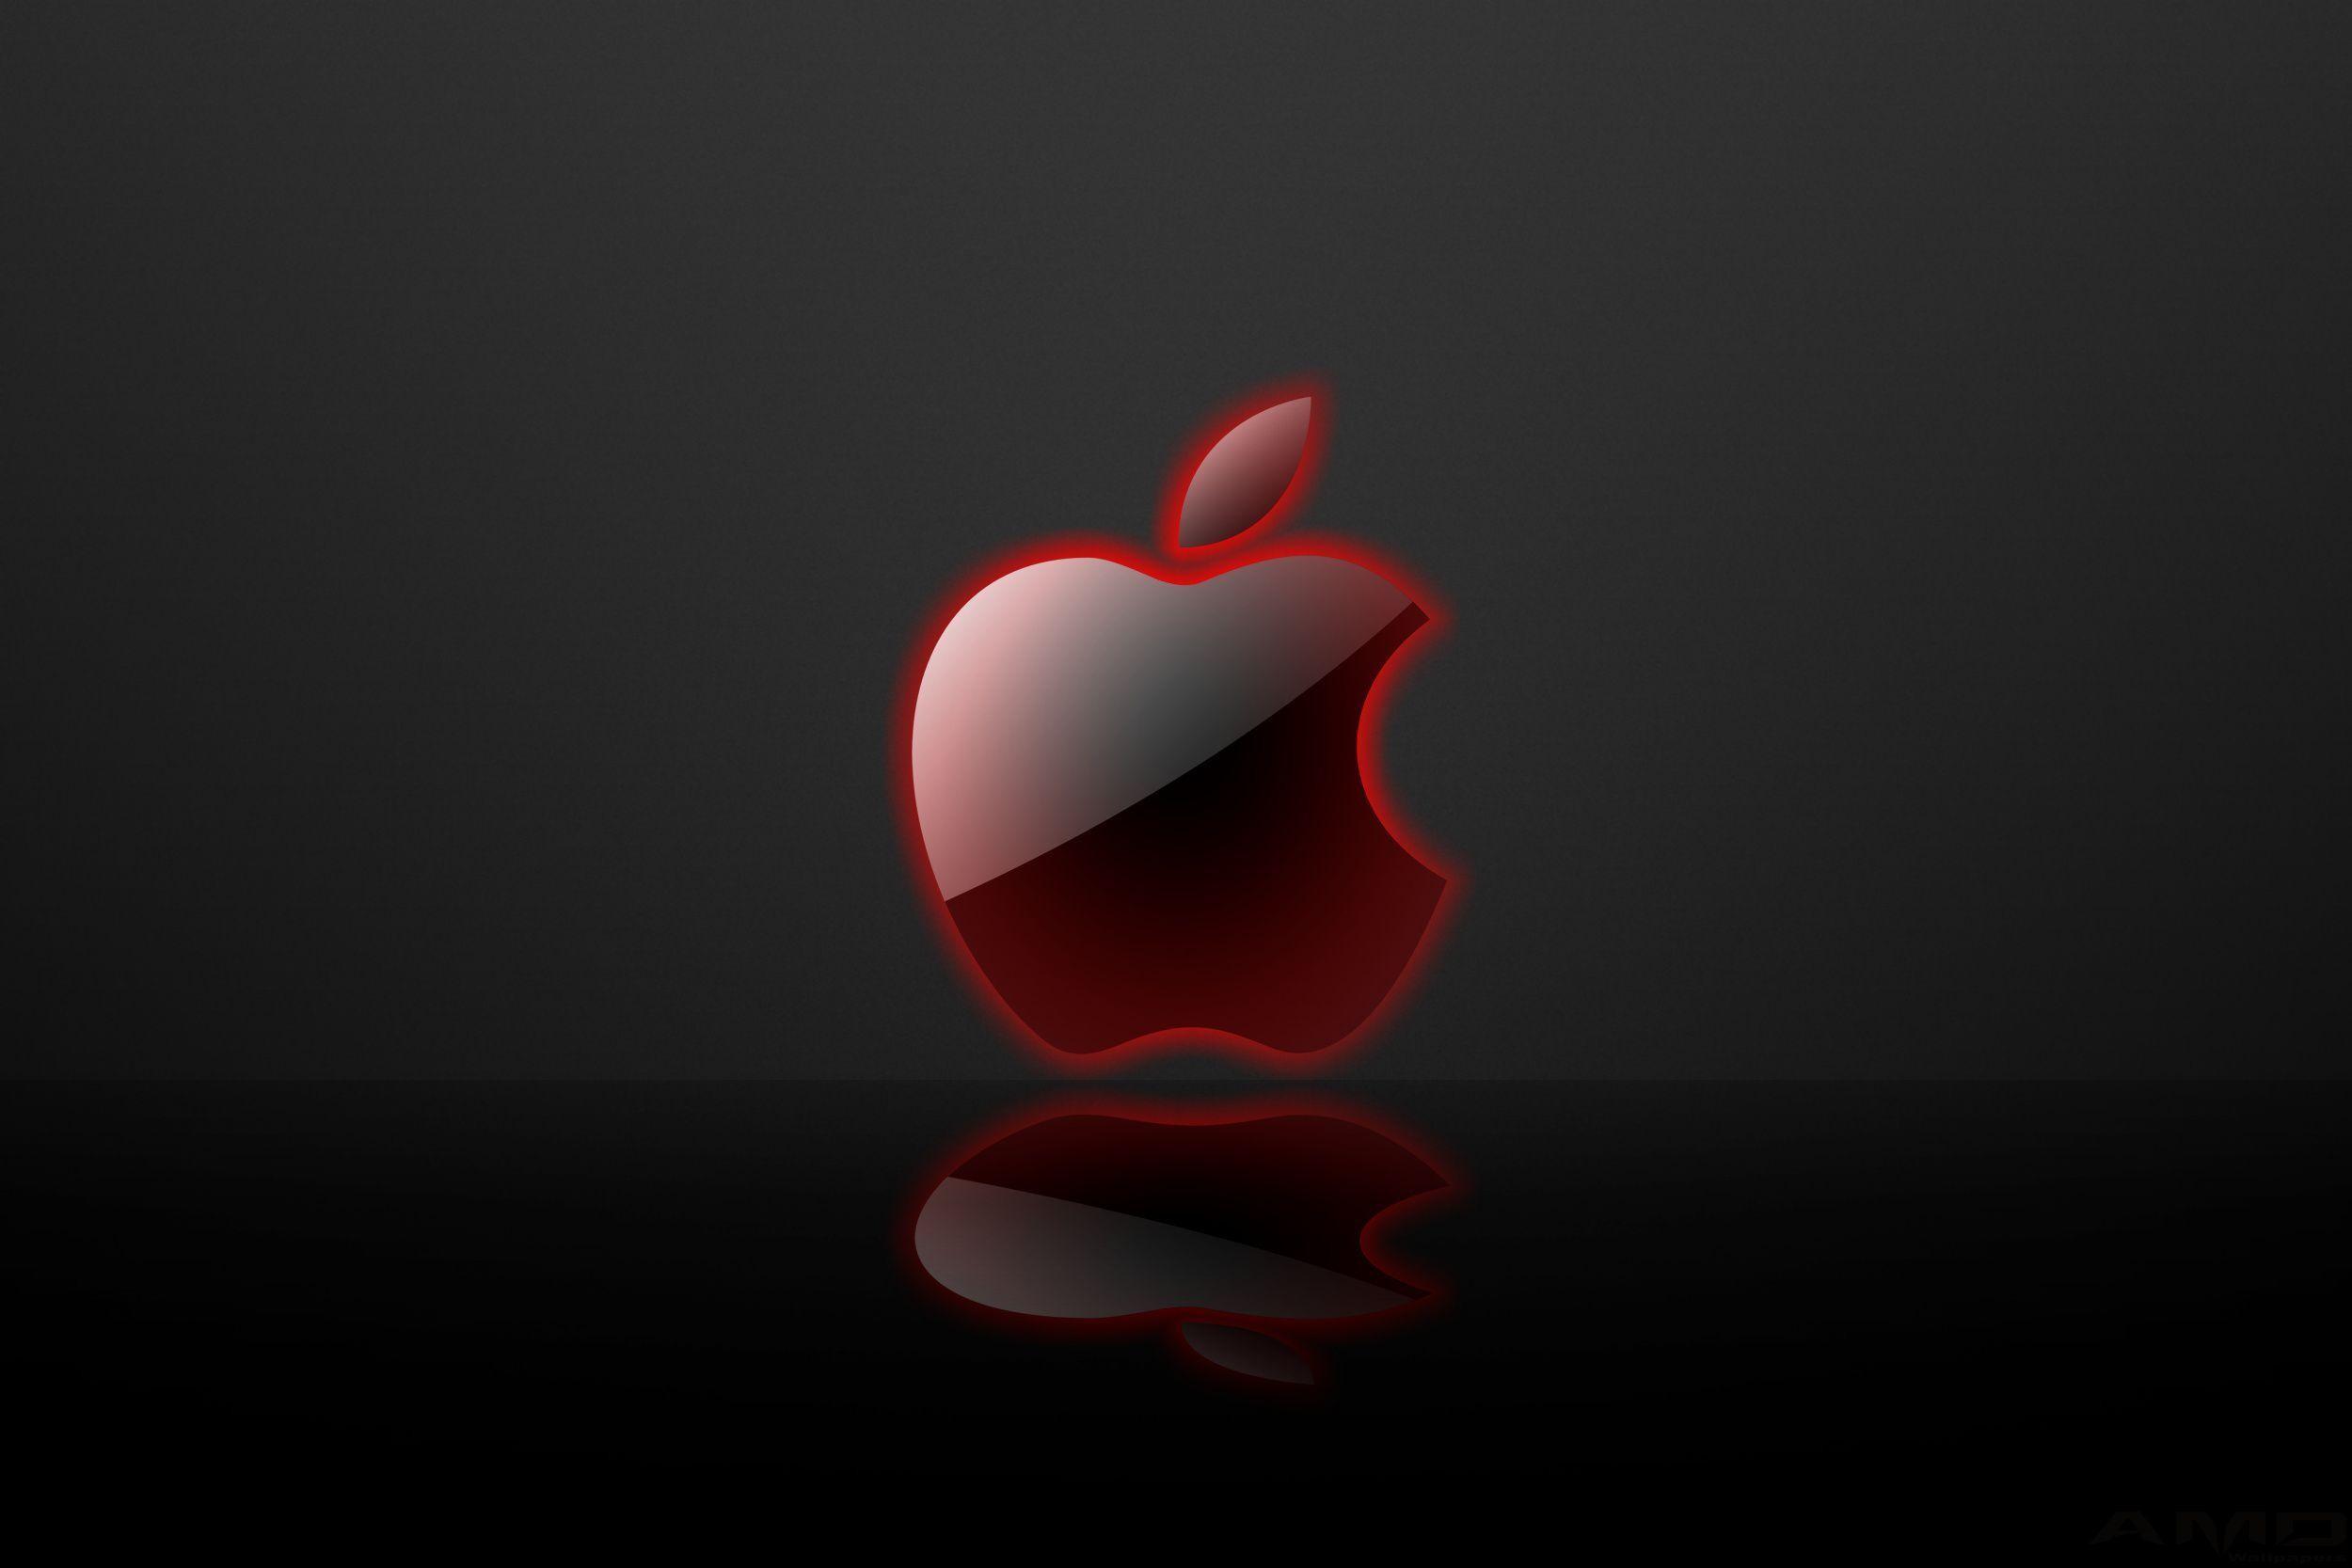 Red Apple Logo Wallpaper (64+ images).